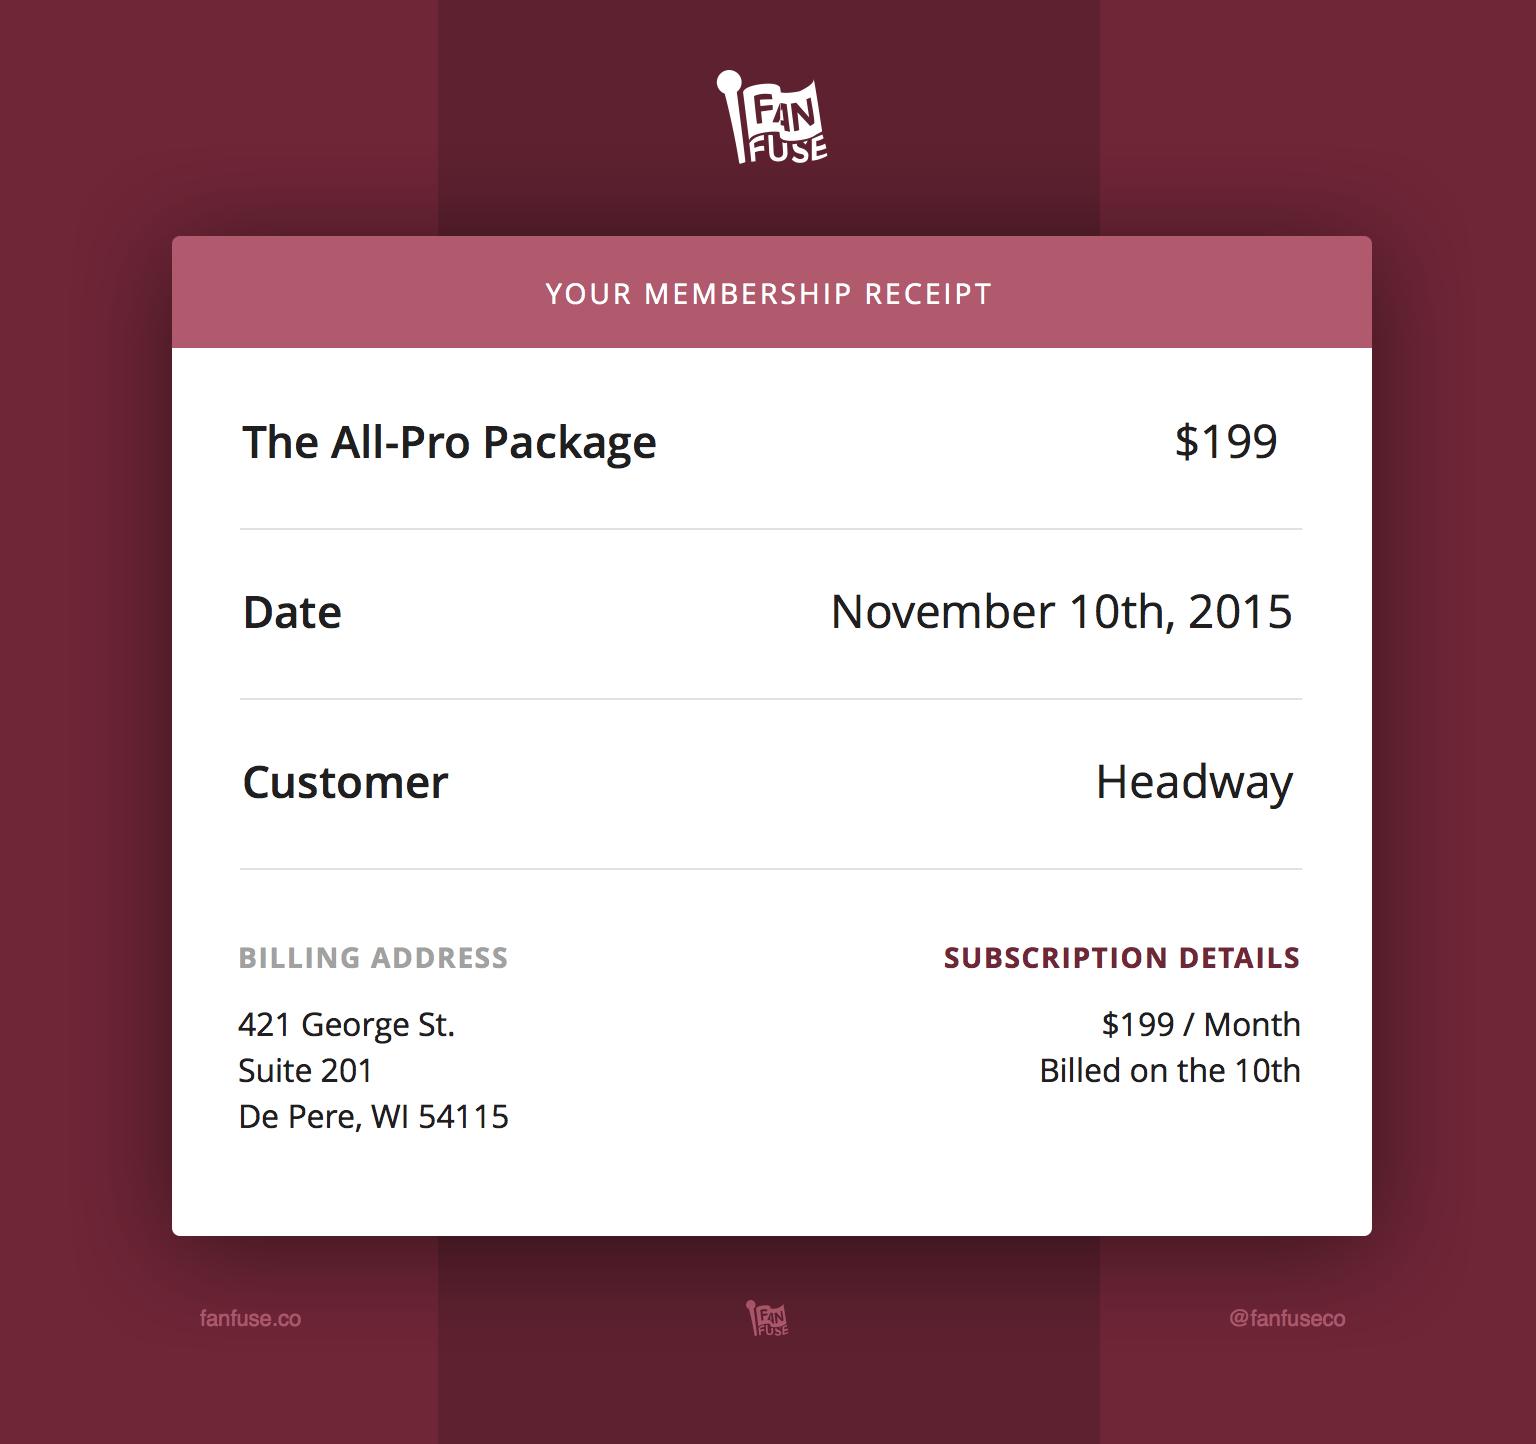 017   emails receipt 2x